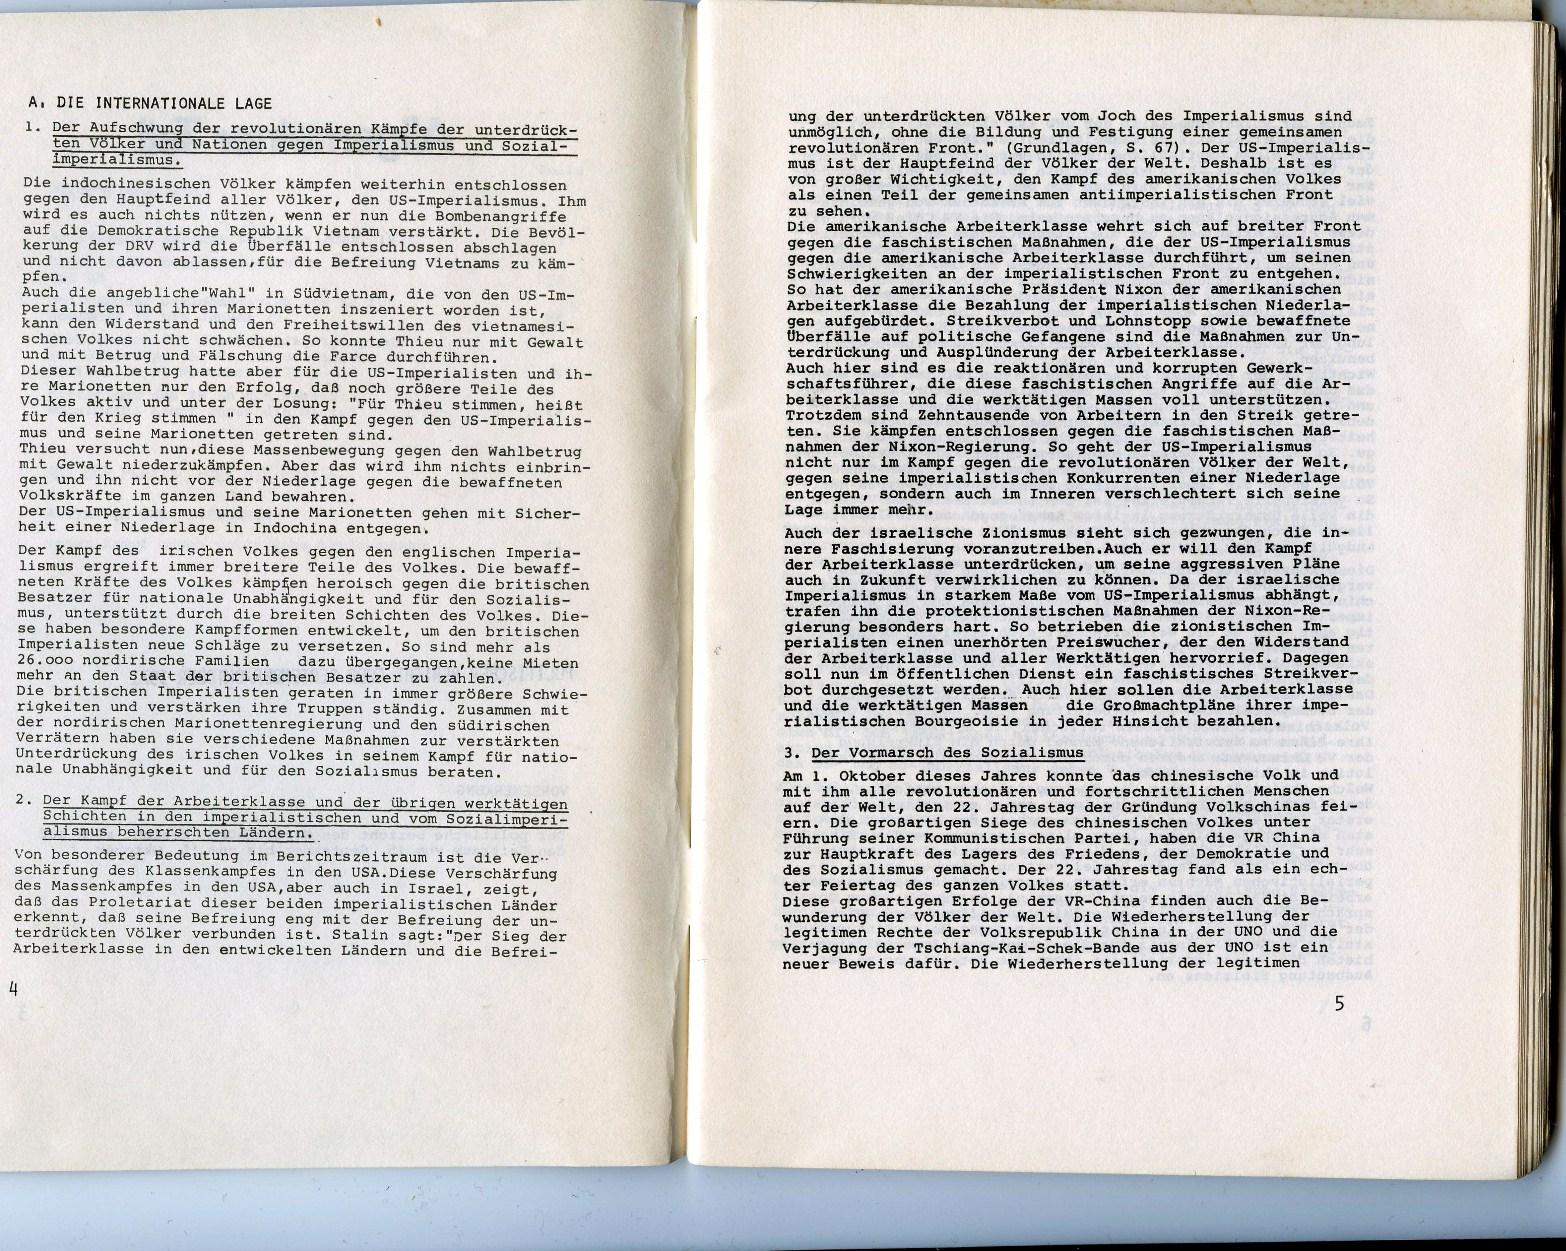 ZB_Parteiarbeiter_1971_09_03